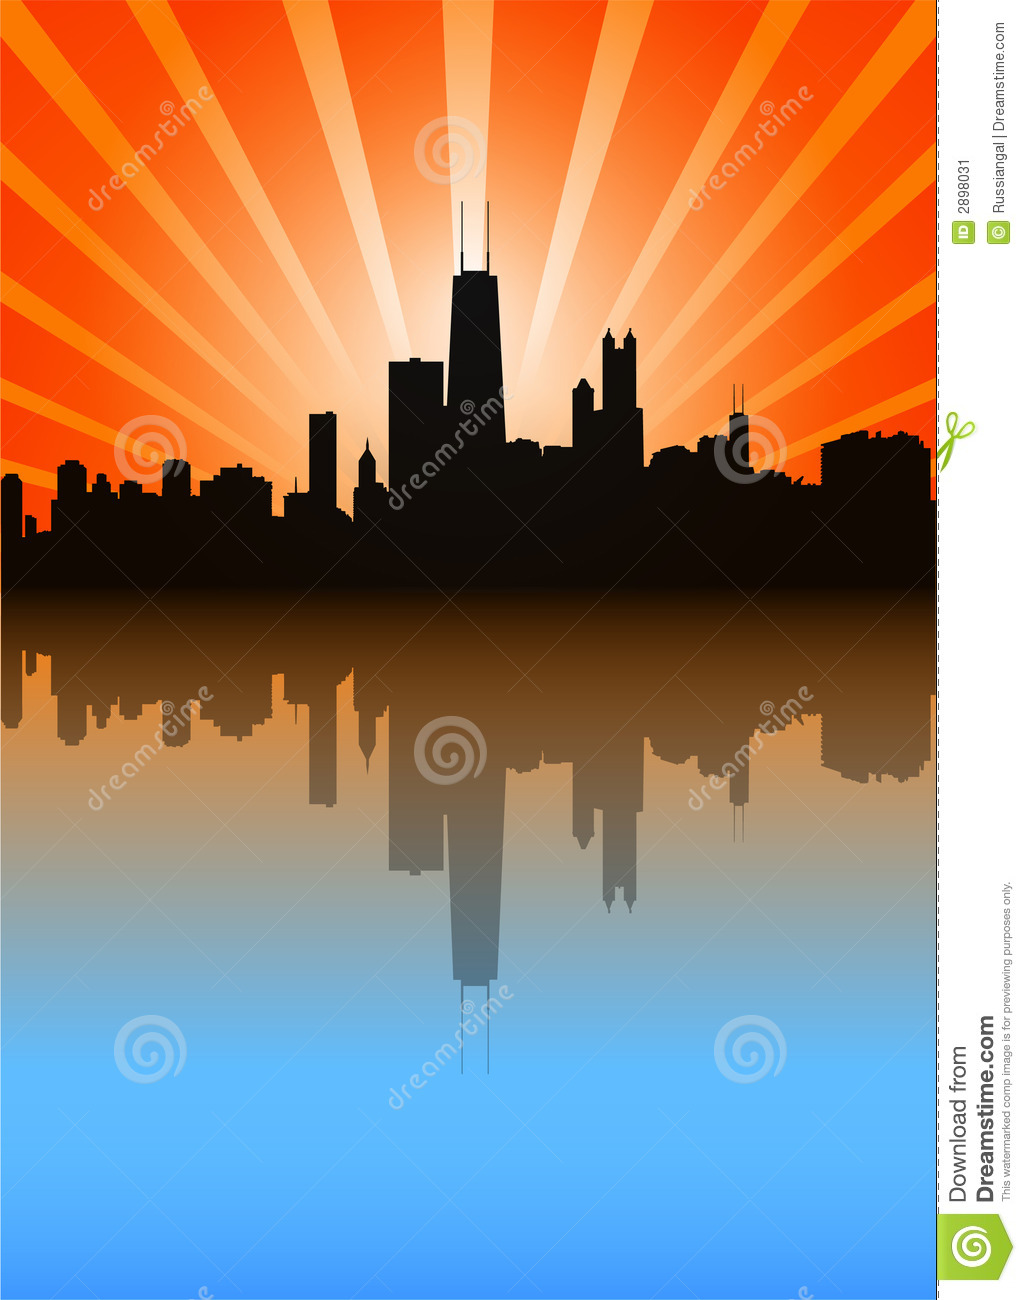 Chicago Skyline Stock Image.